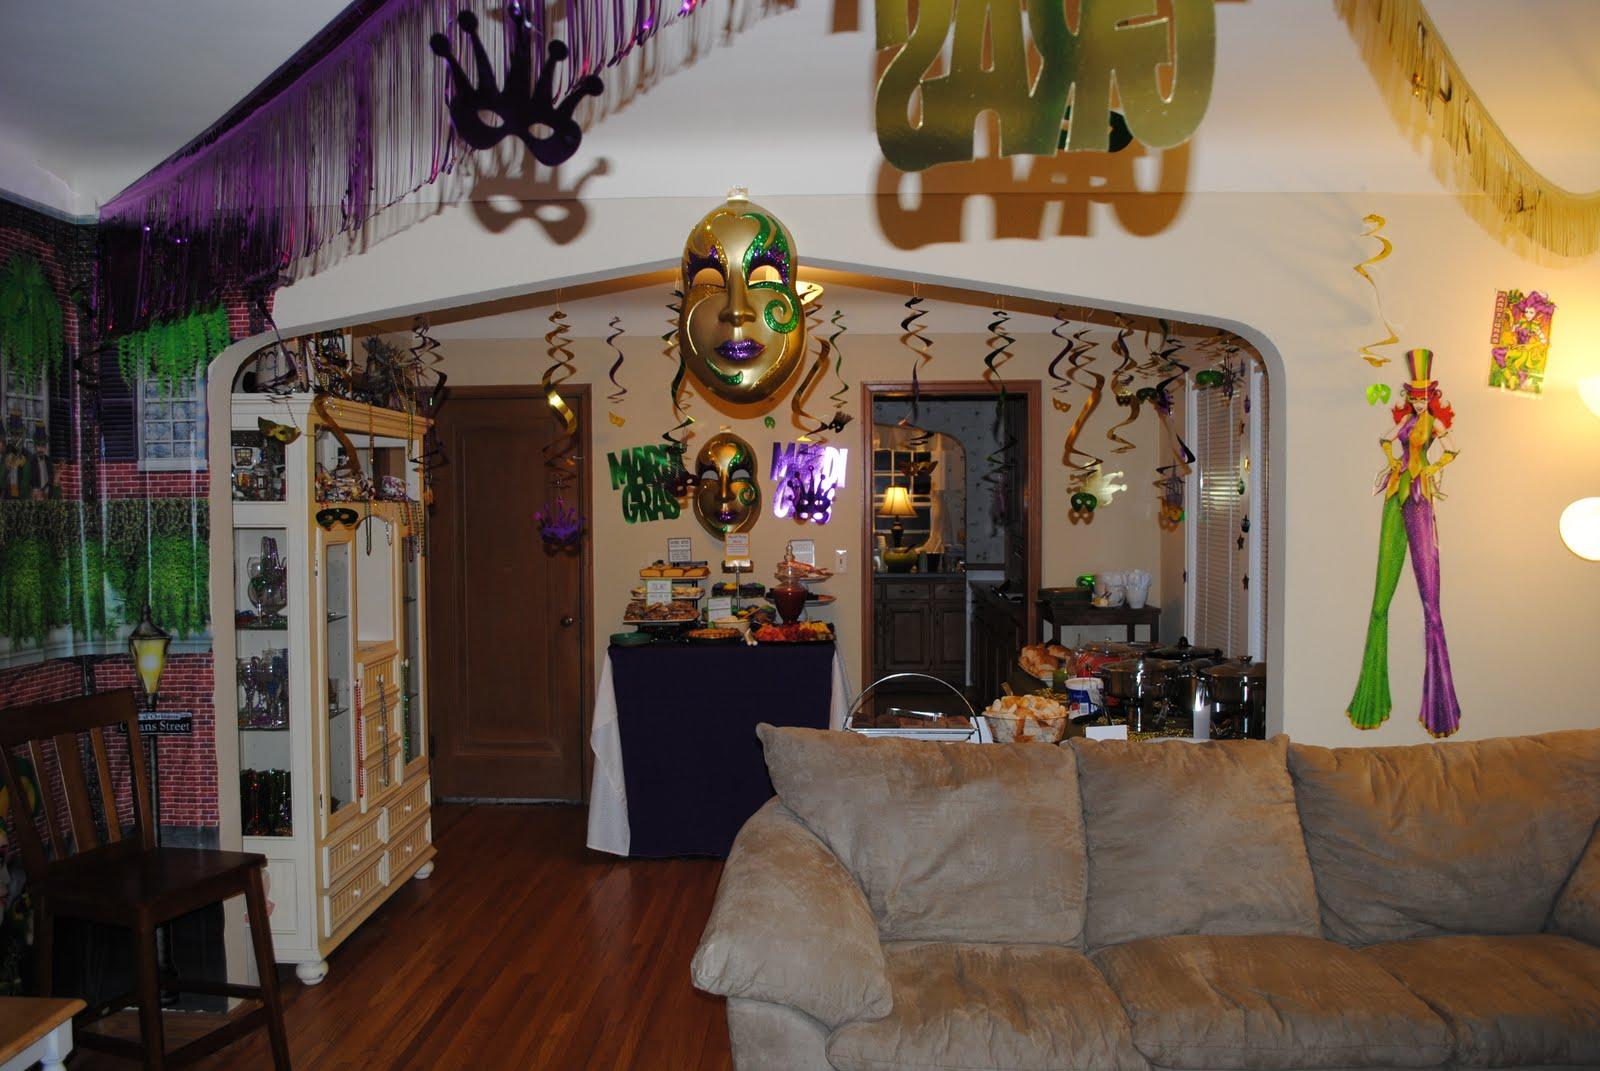 Heathers creative life romp in the swamp louisiana halloween party romp in the swamp louisiana halloween party mardi gras decor arubaitofo Choice Image